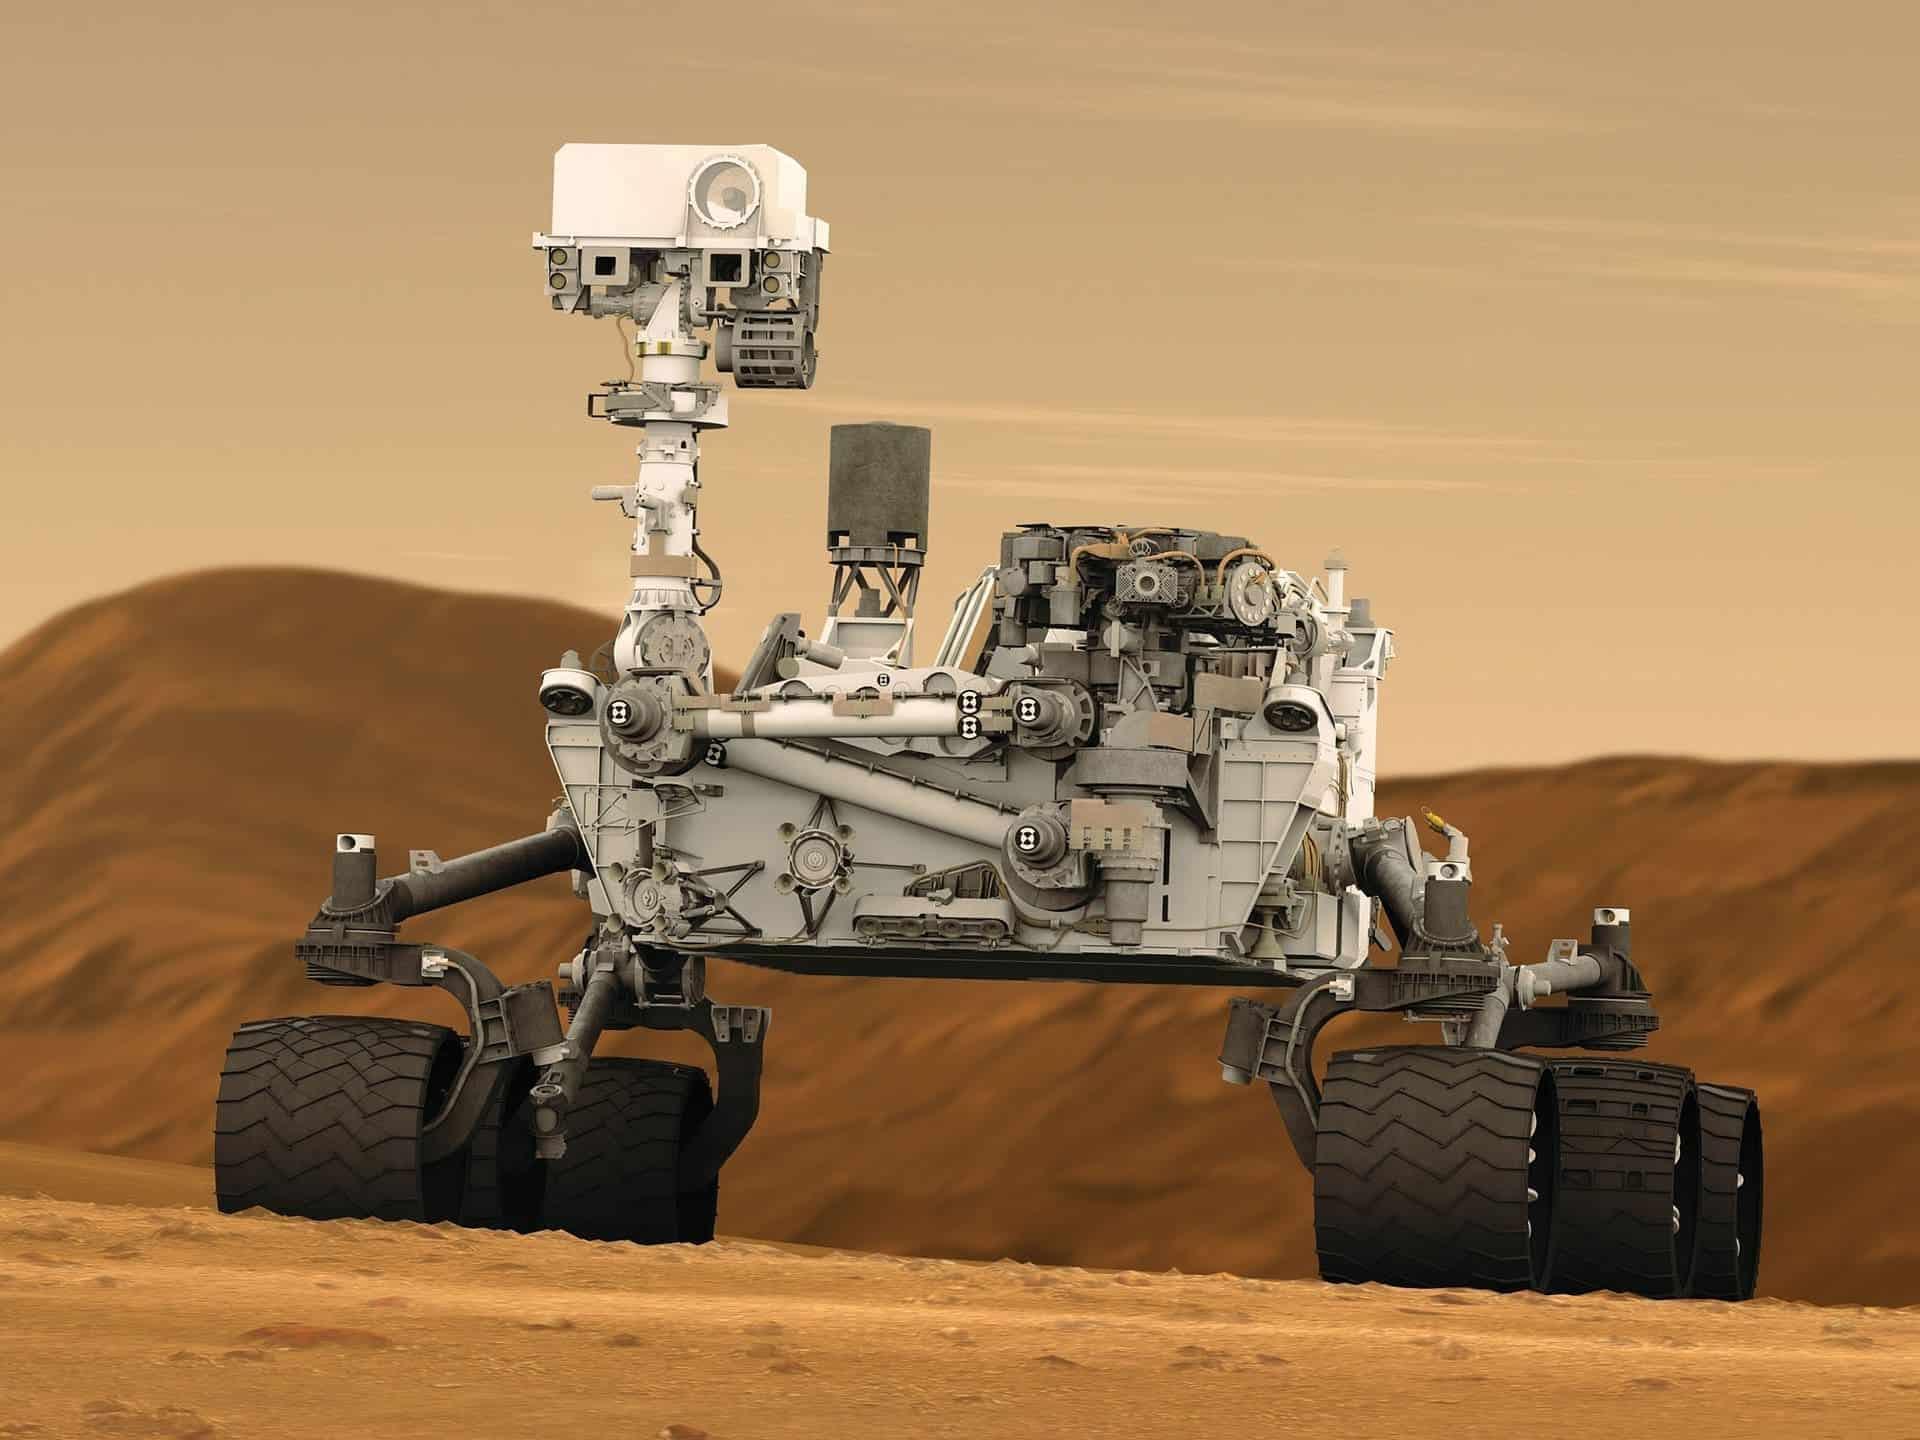 curiosity robot